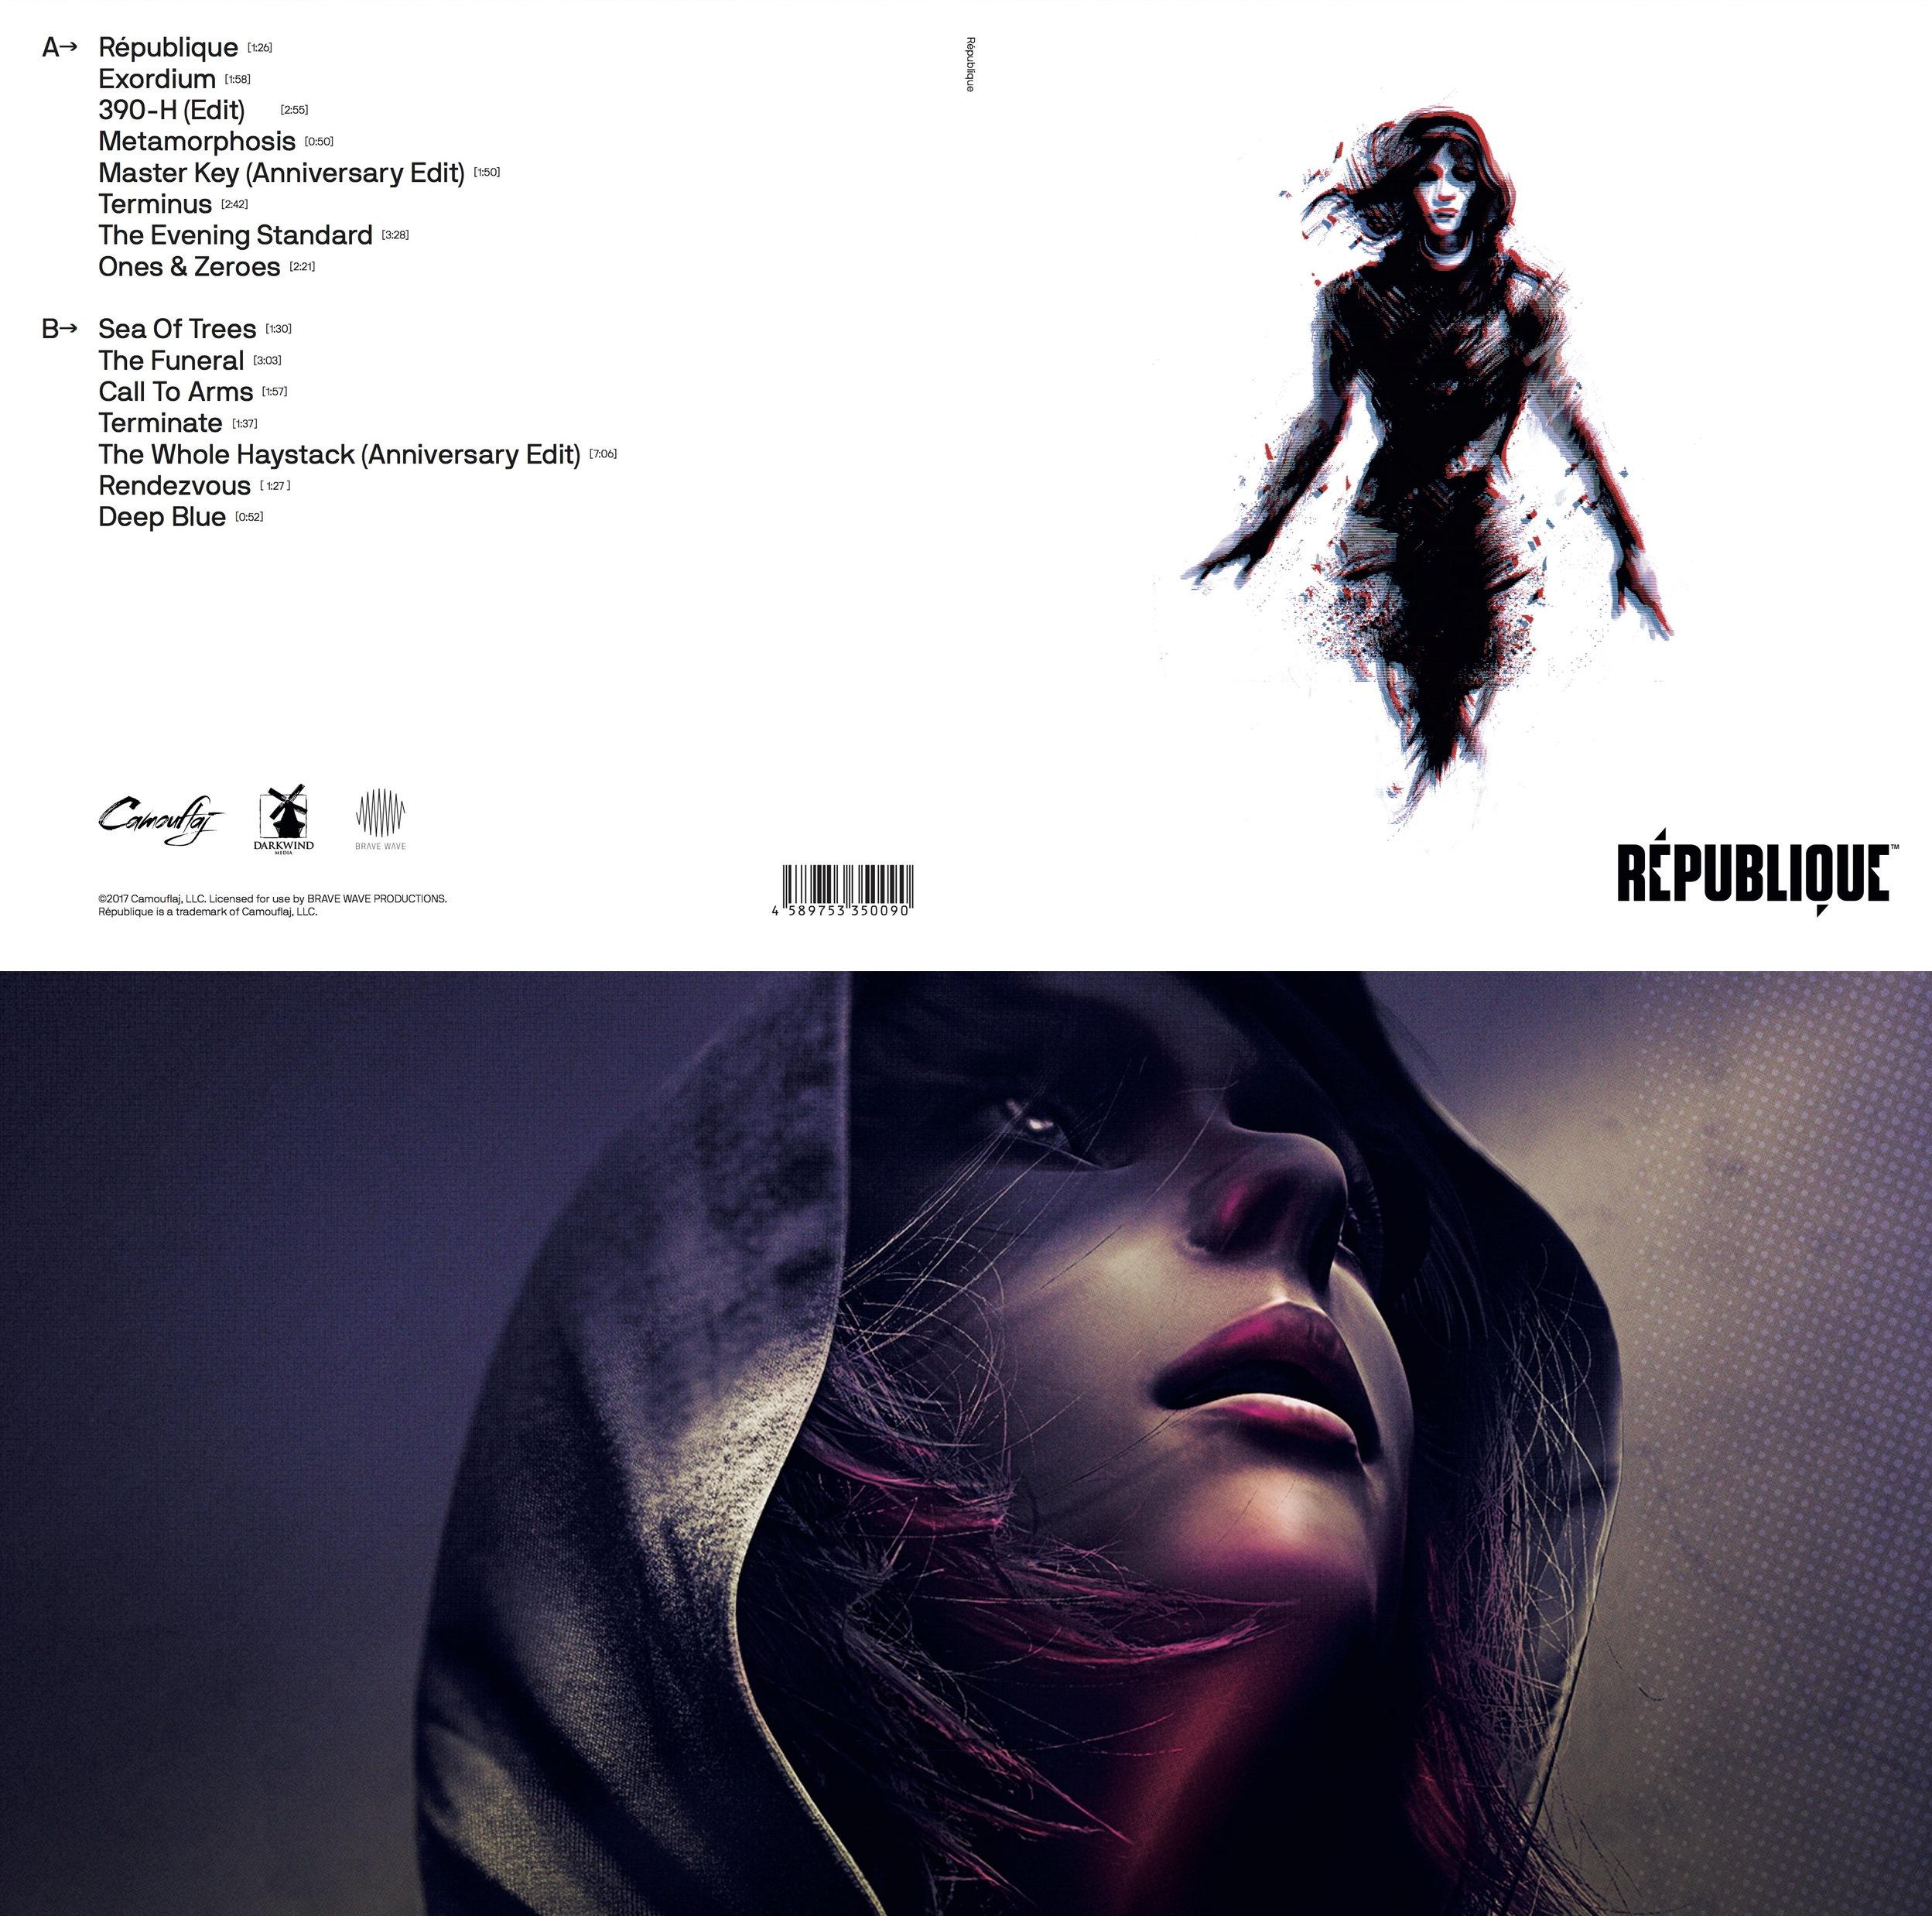 REP-Vinyl-Gatefold.png